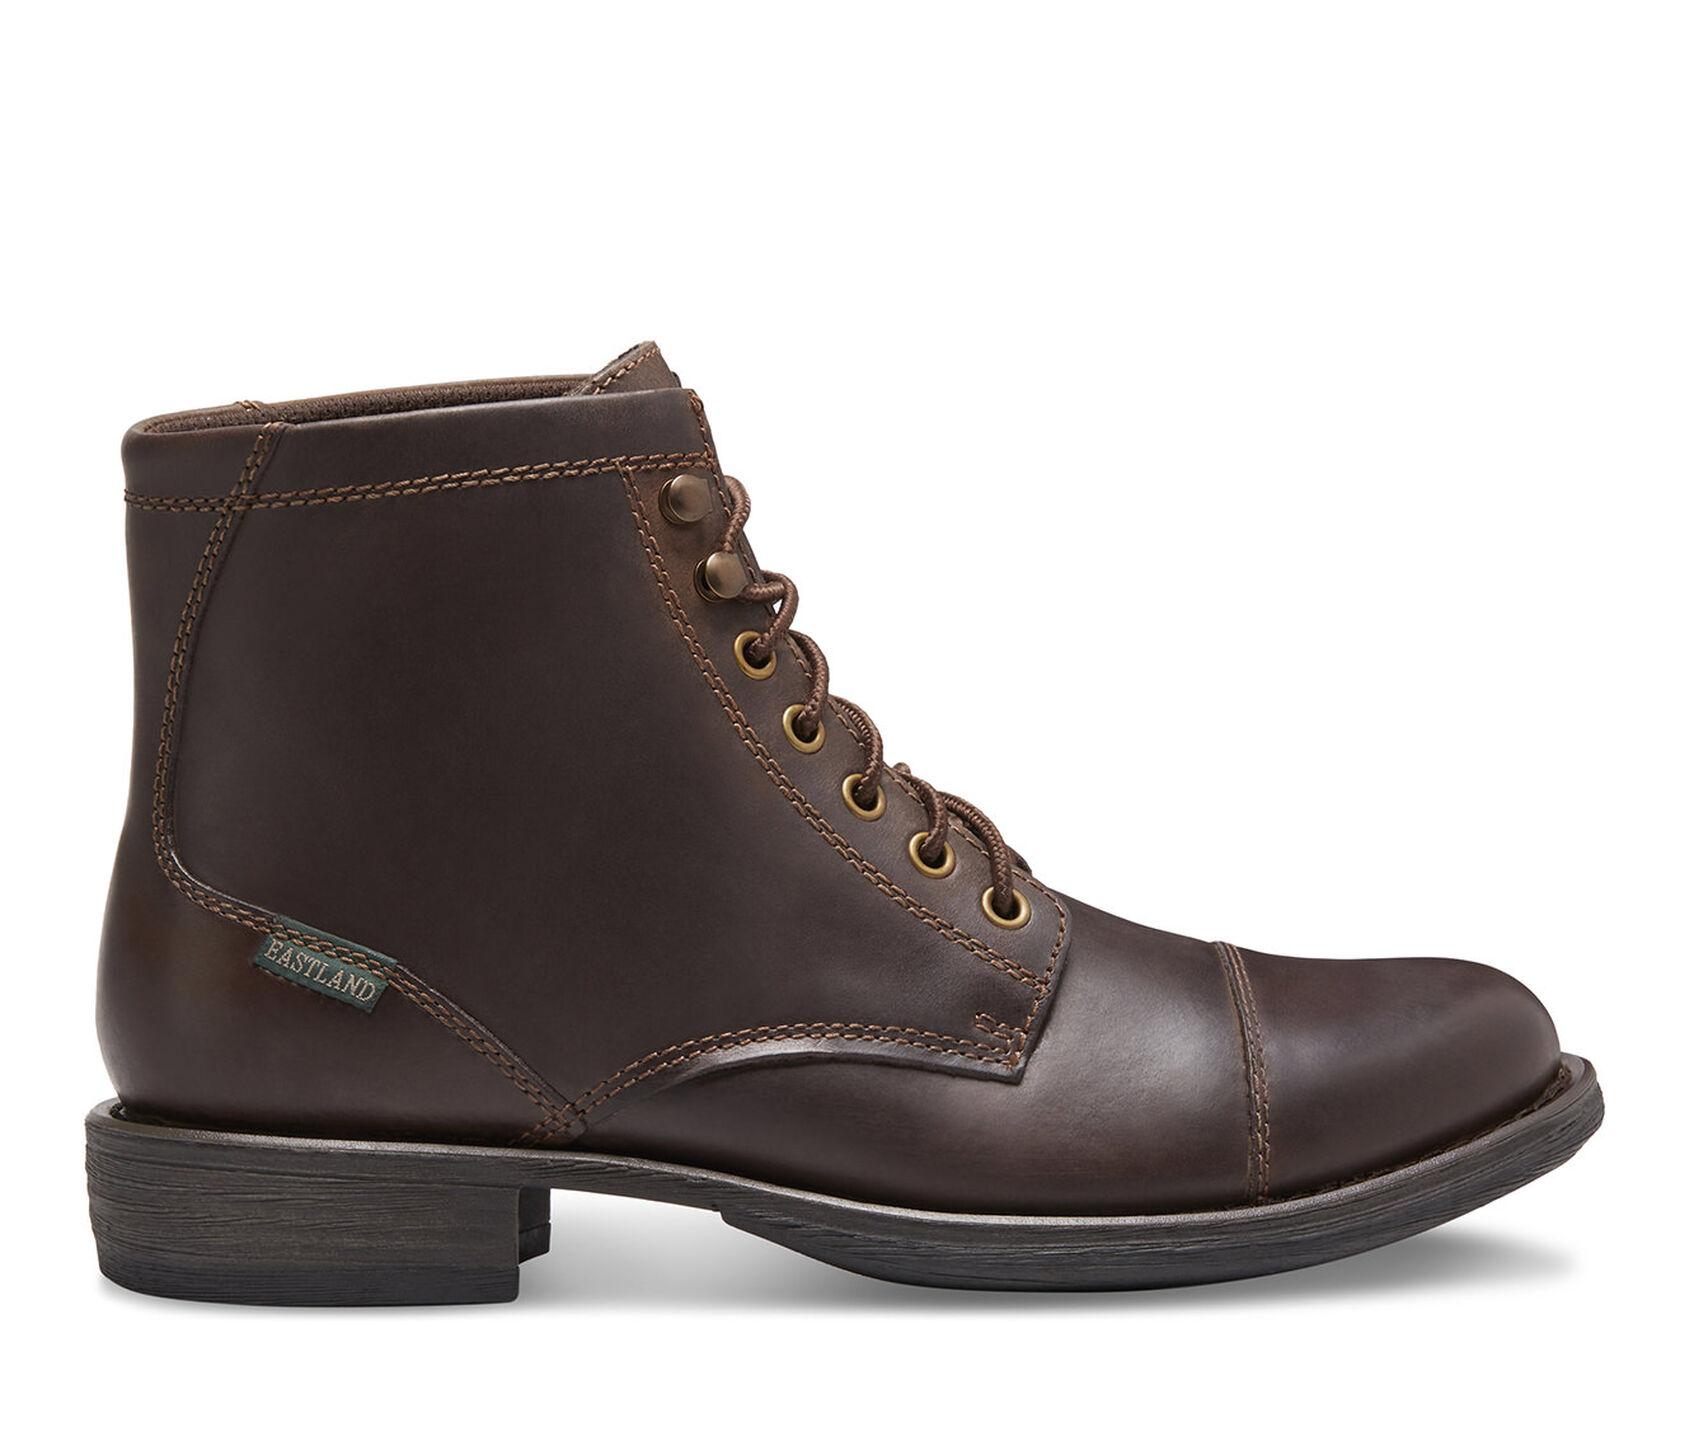 9a97232e7c0 Men's Eastland High Fidelity Boots